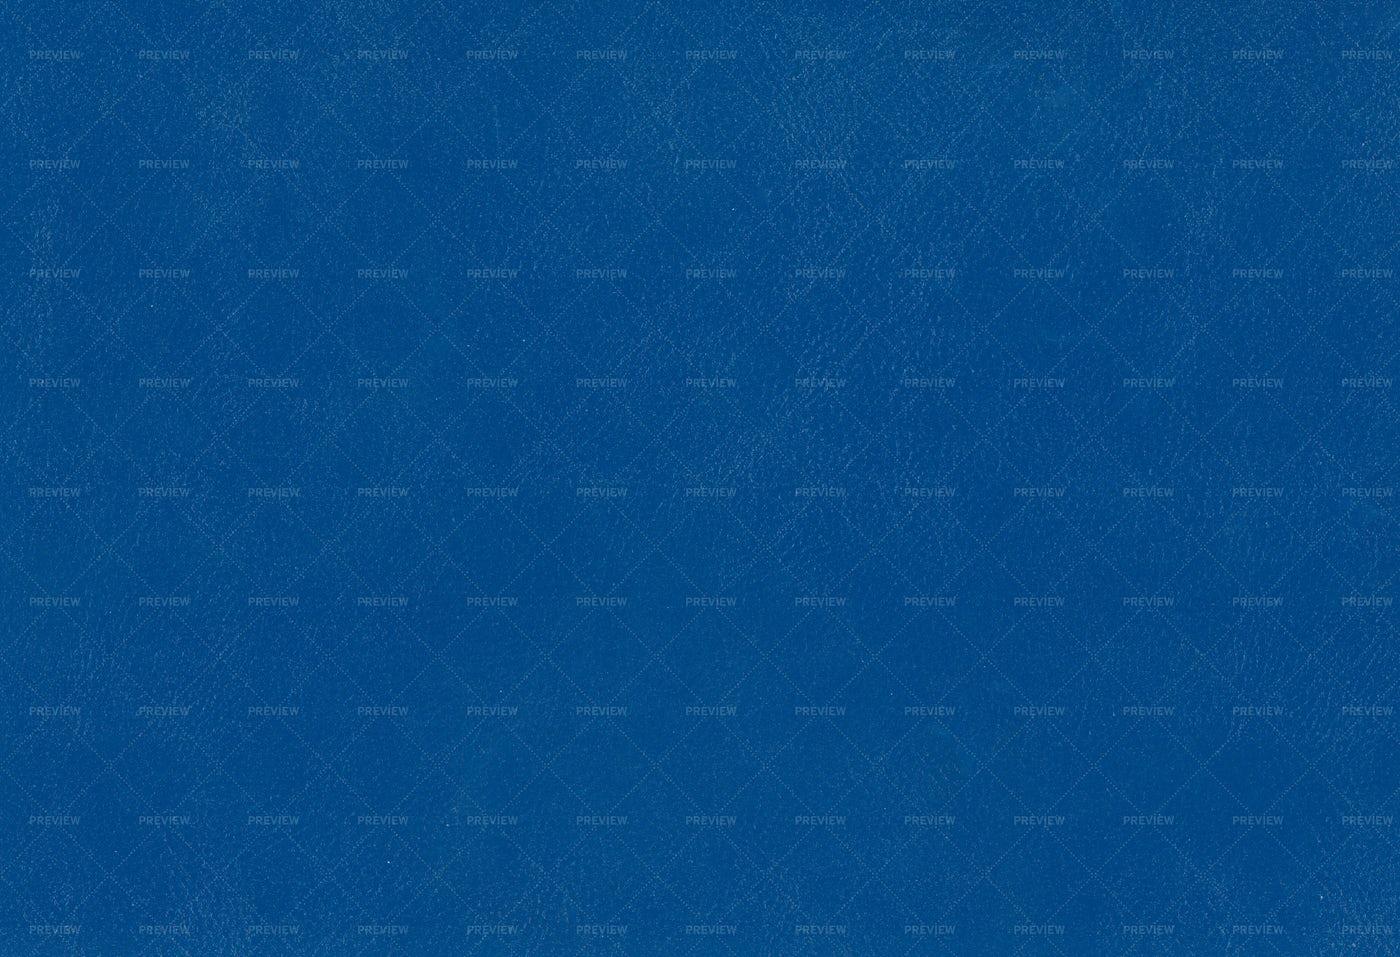 Blue Leatherette Texture: Stock Photos